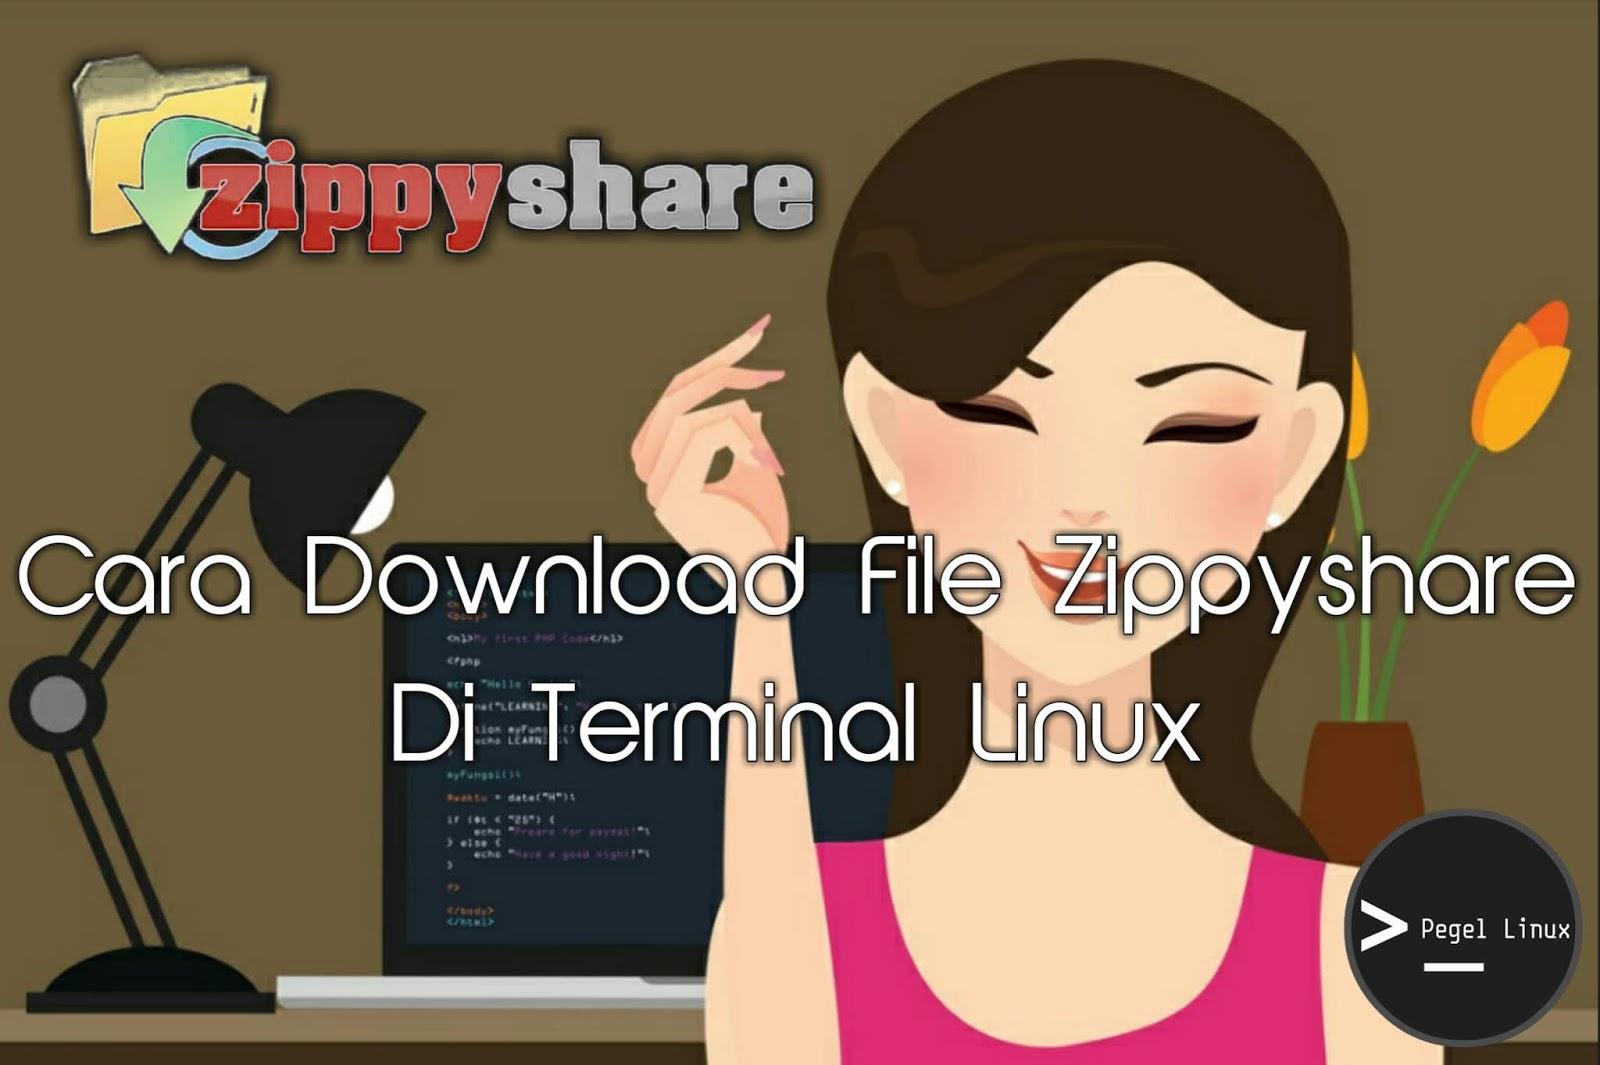 Pegel Linux